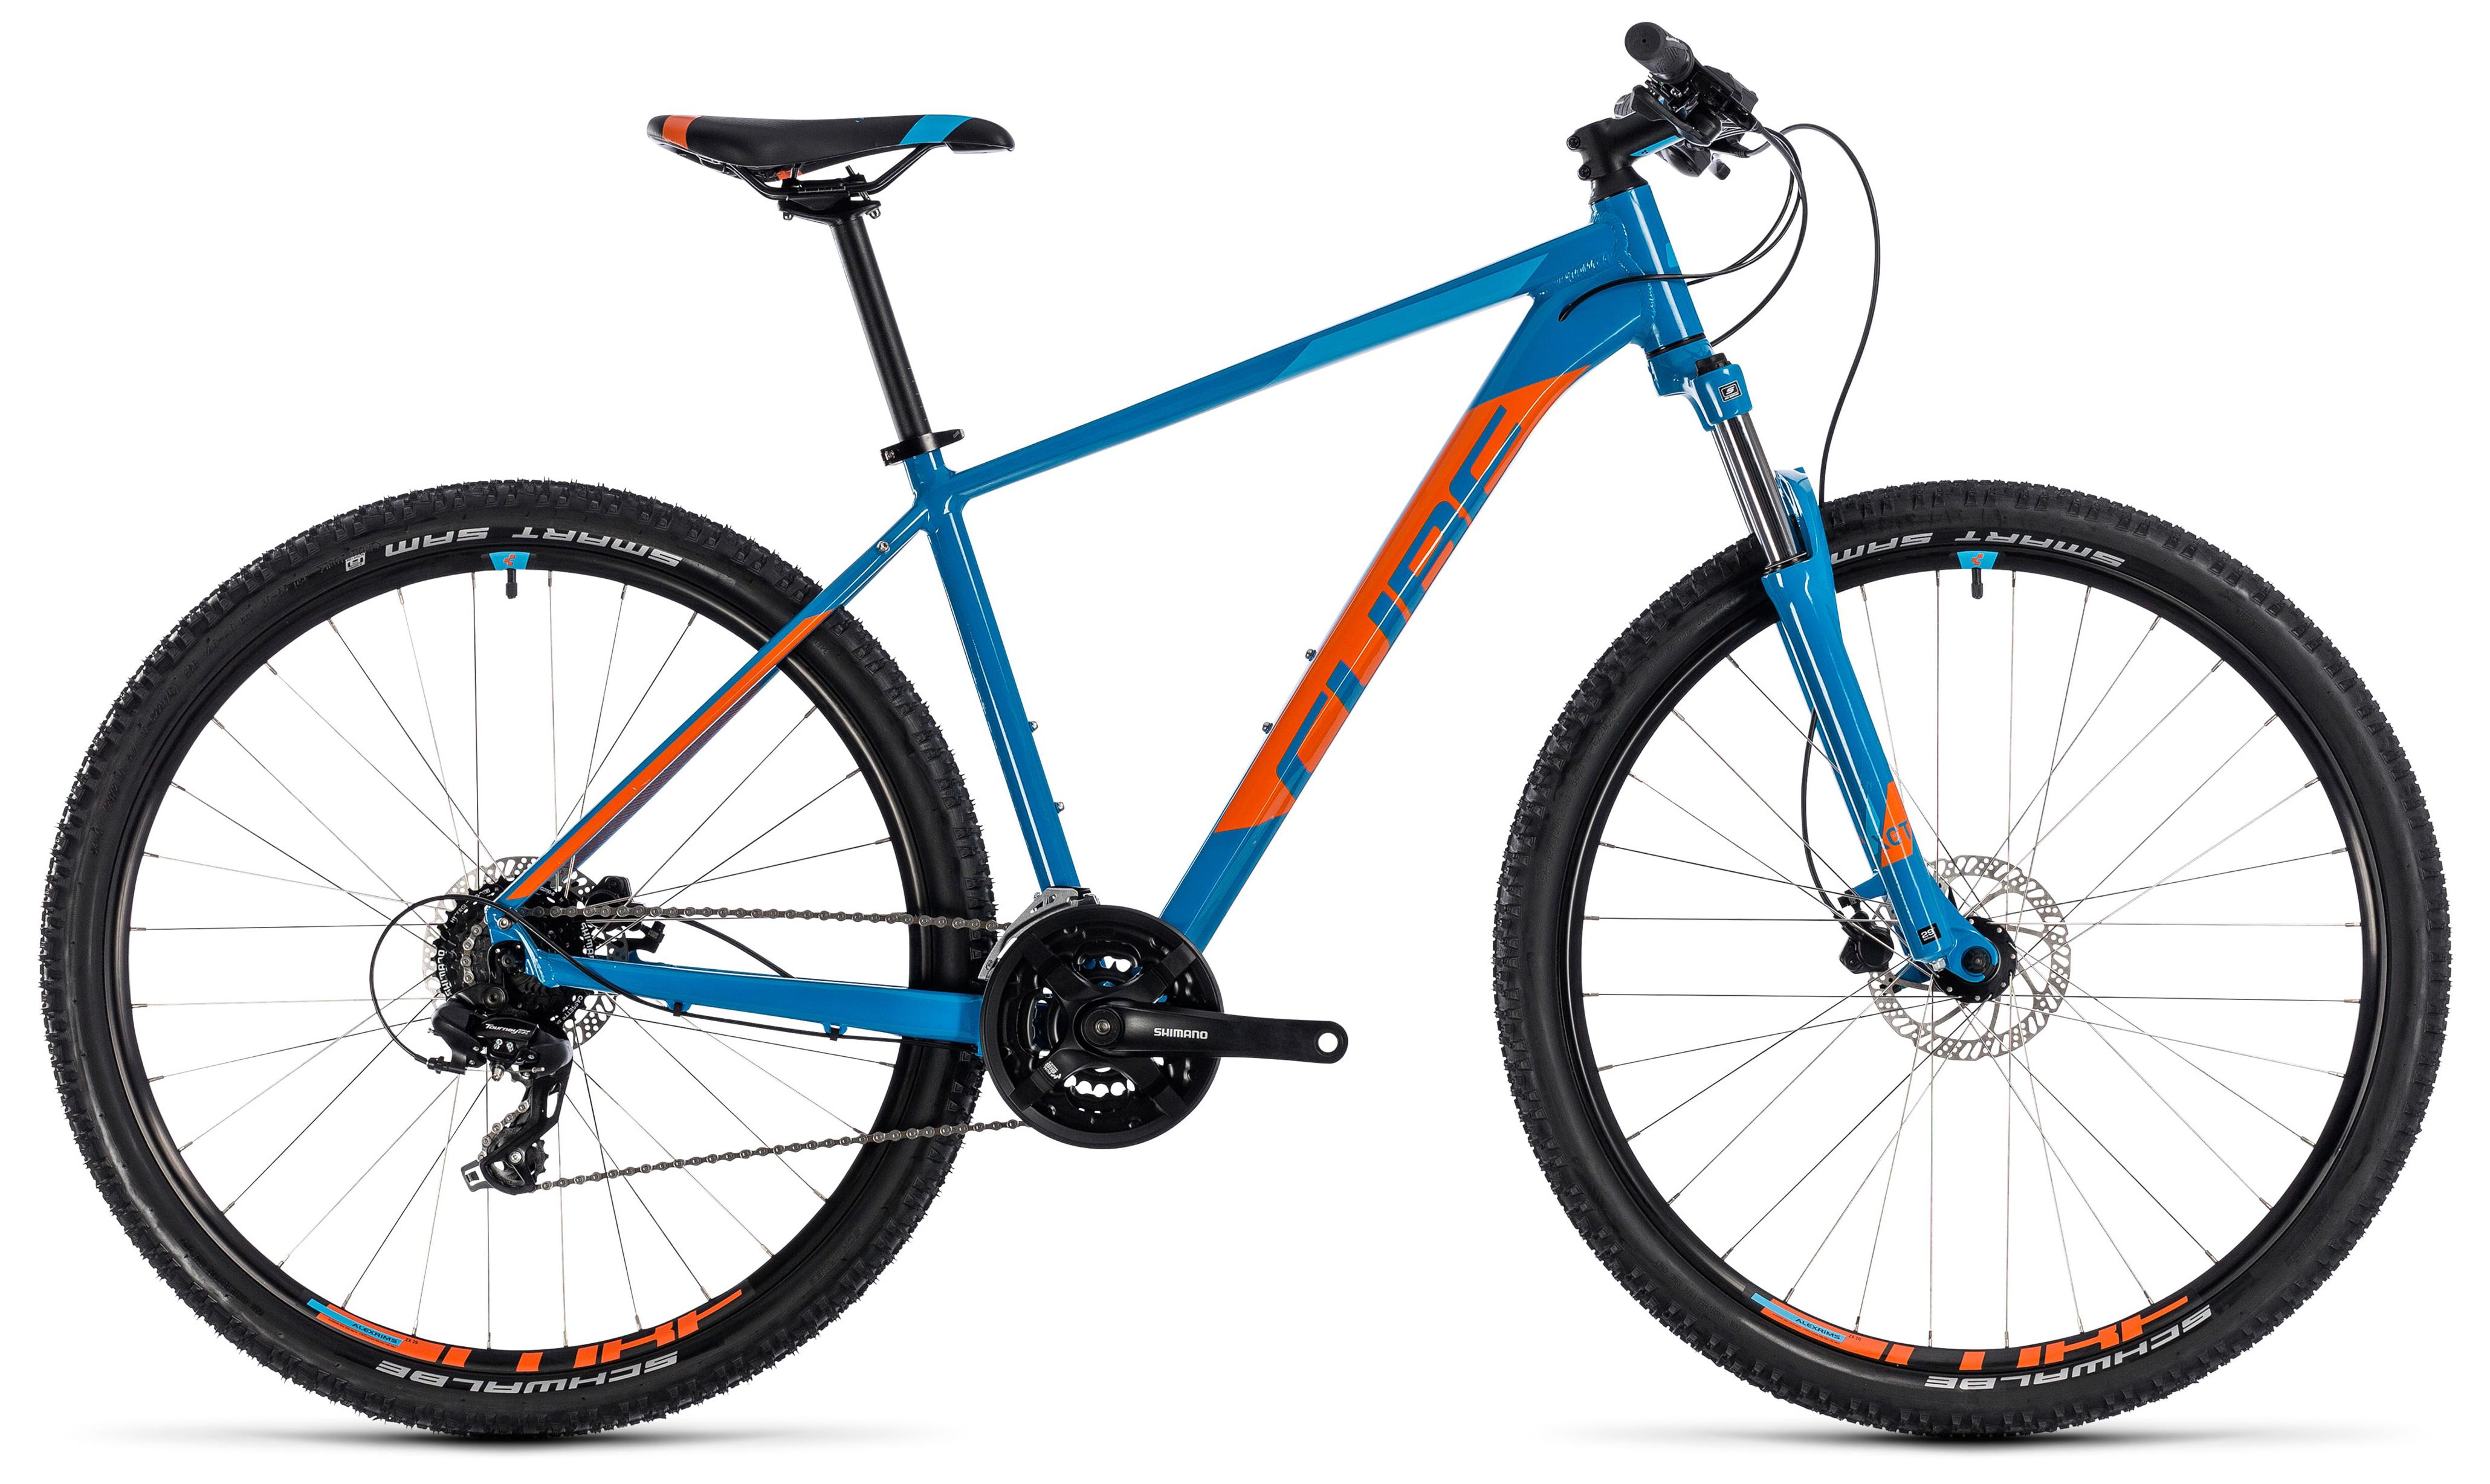 Велосипед Cube AIM Pro SE 29 2018 велосипед cube analog 29 2015